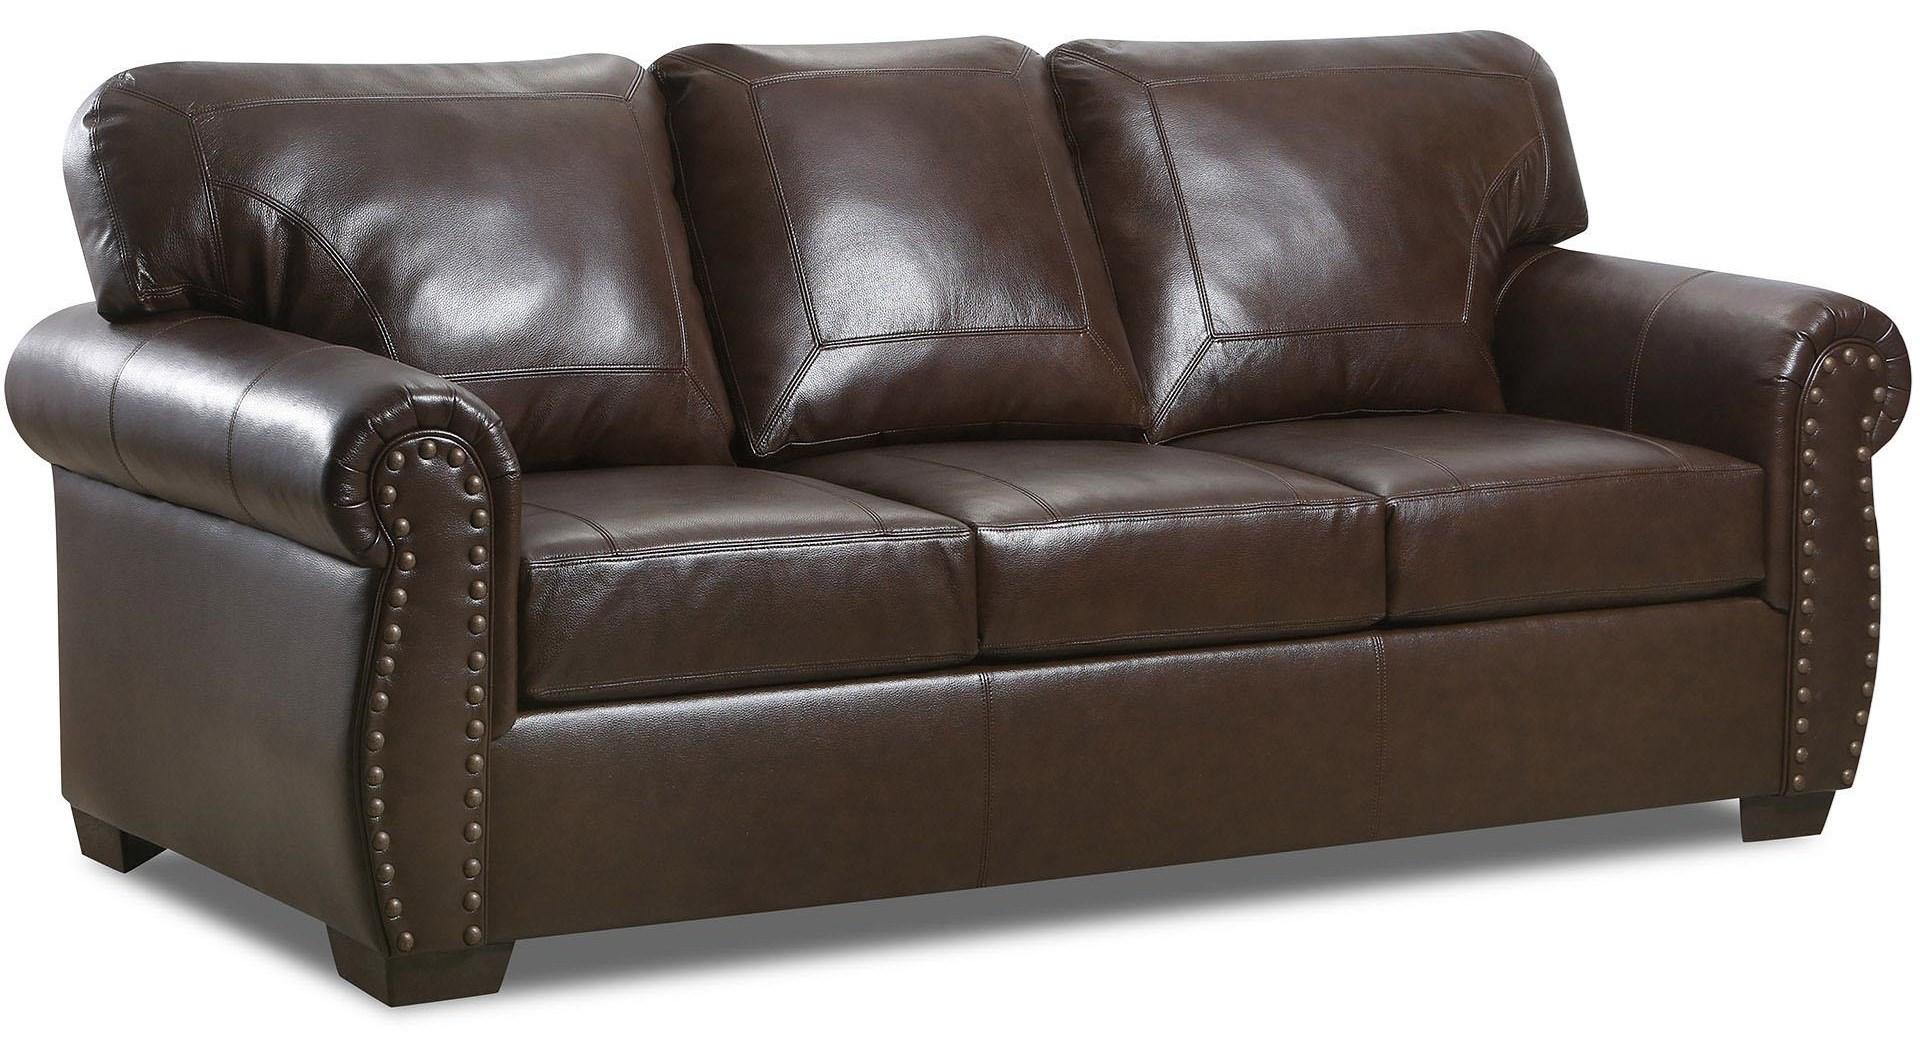 2075 Leather Nail Head Sofa by Lane at Furniture Fair - North Carolina